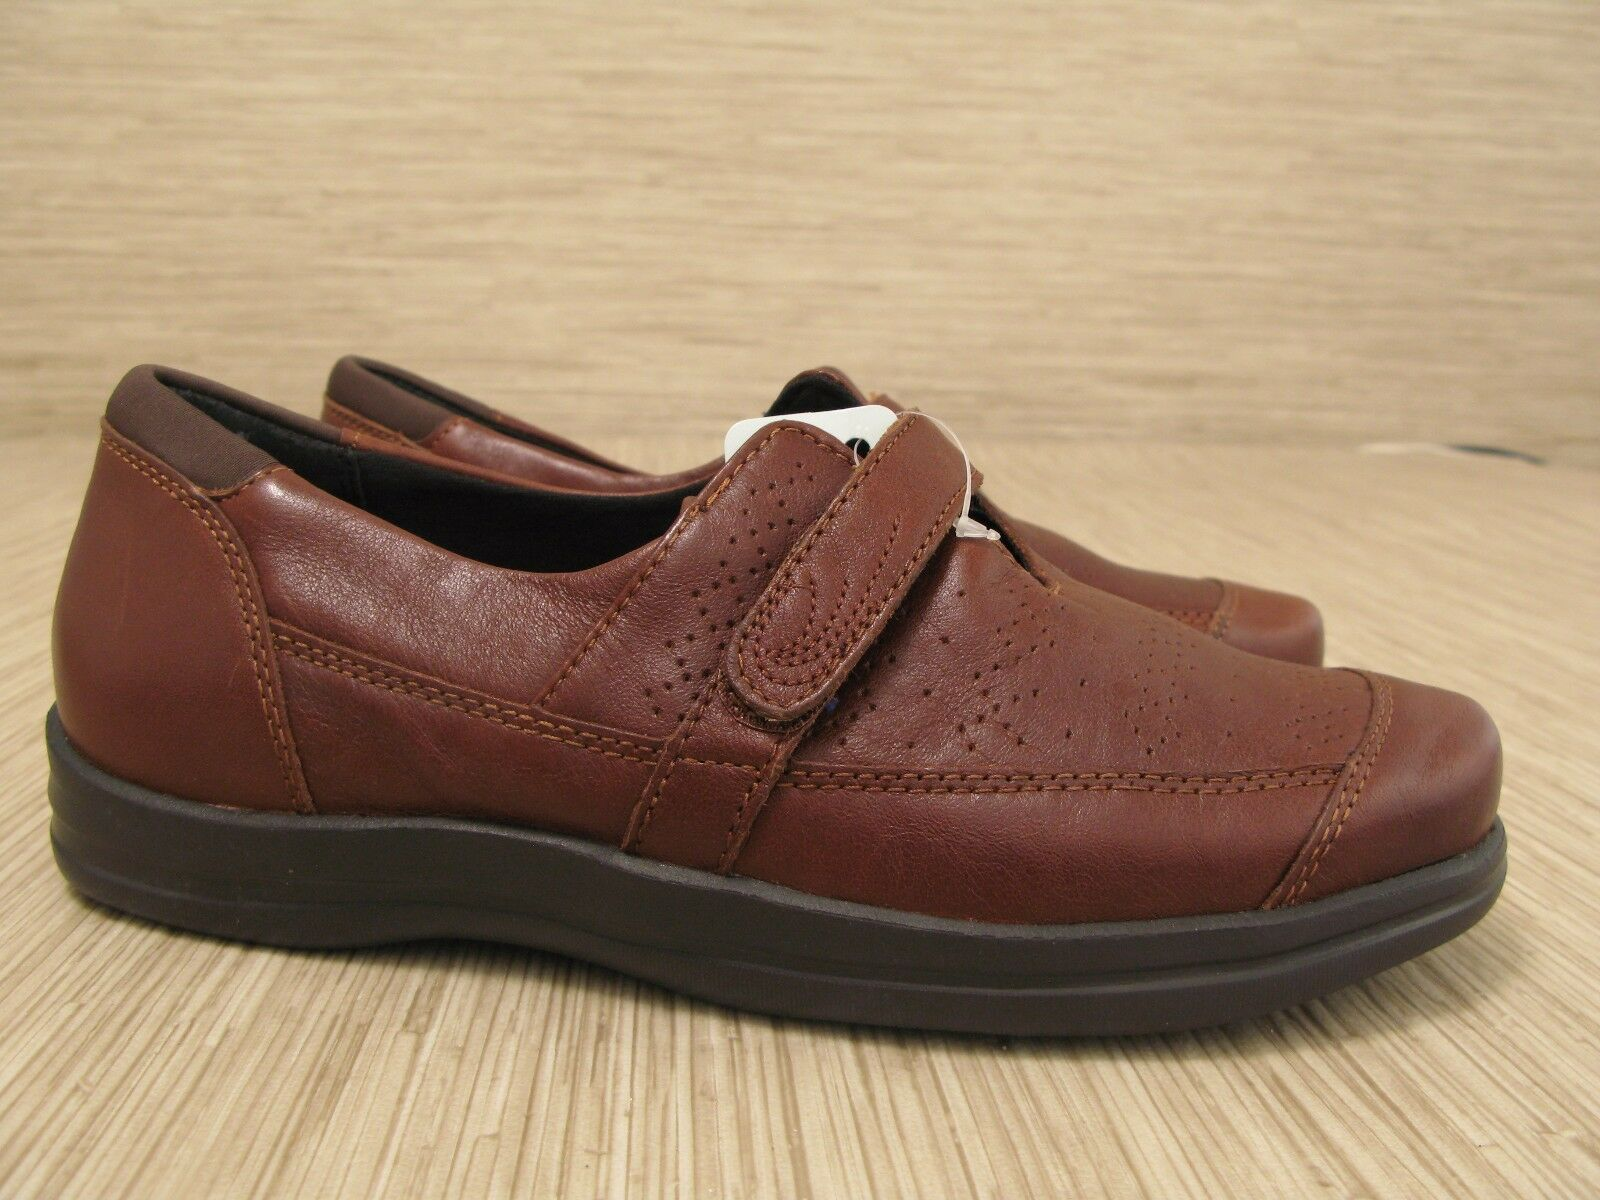 Apex Petals Braun 9 Leder Schuhes Damenschuhe US 9 Braun M EUR 41 Strap Slip-Resistant Server 4ff1ba